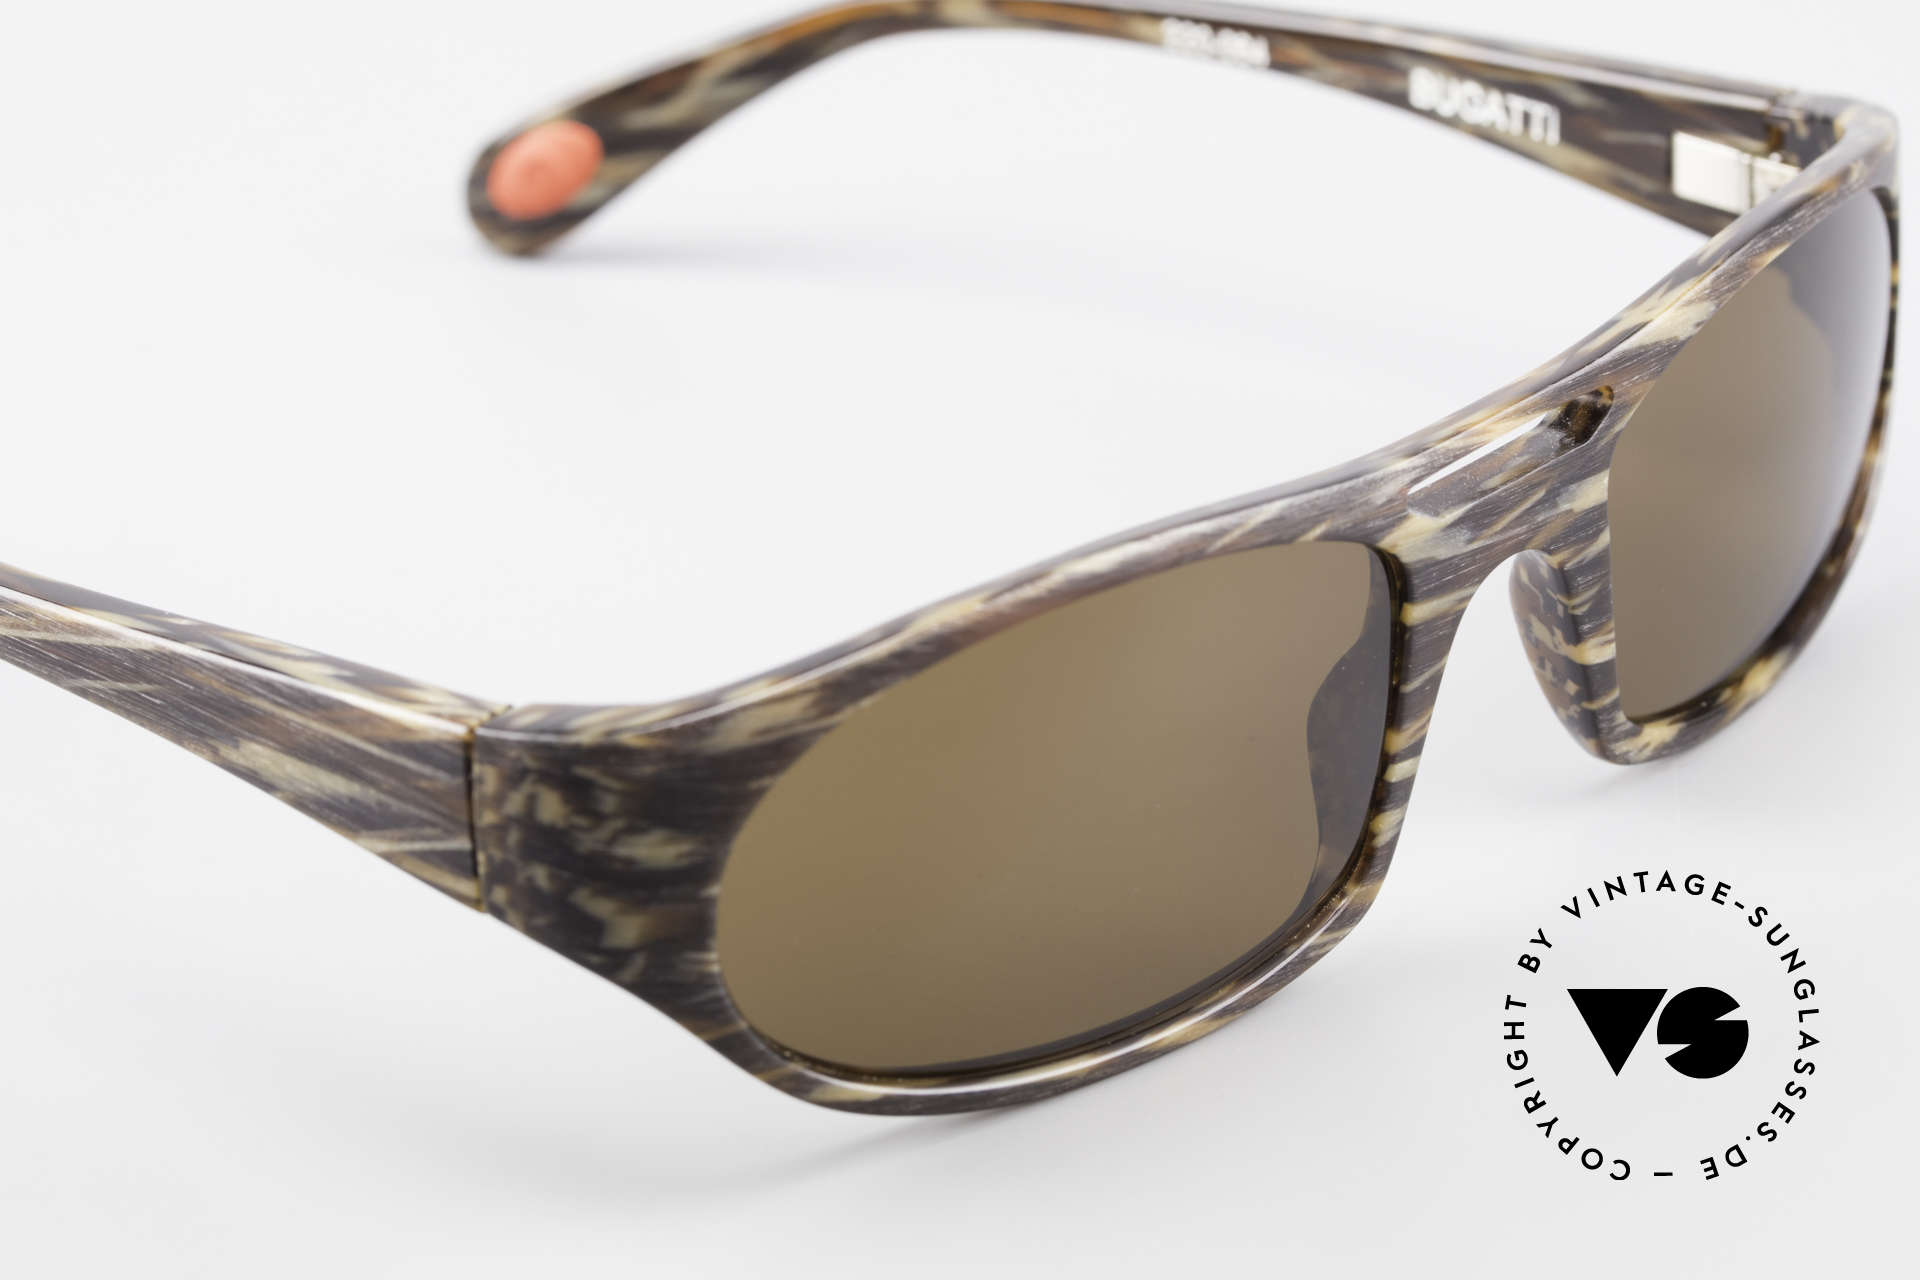 Bugatti 220 Rare Designer Luxury Shades, dark brown sun lenses for 100% UV protection, Made for Men